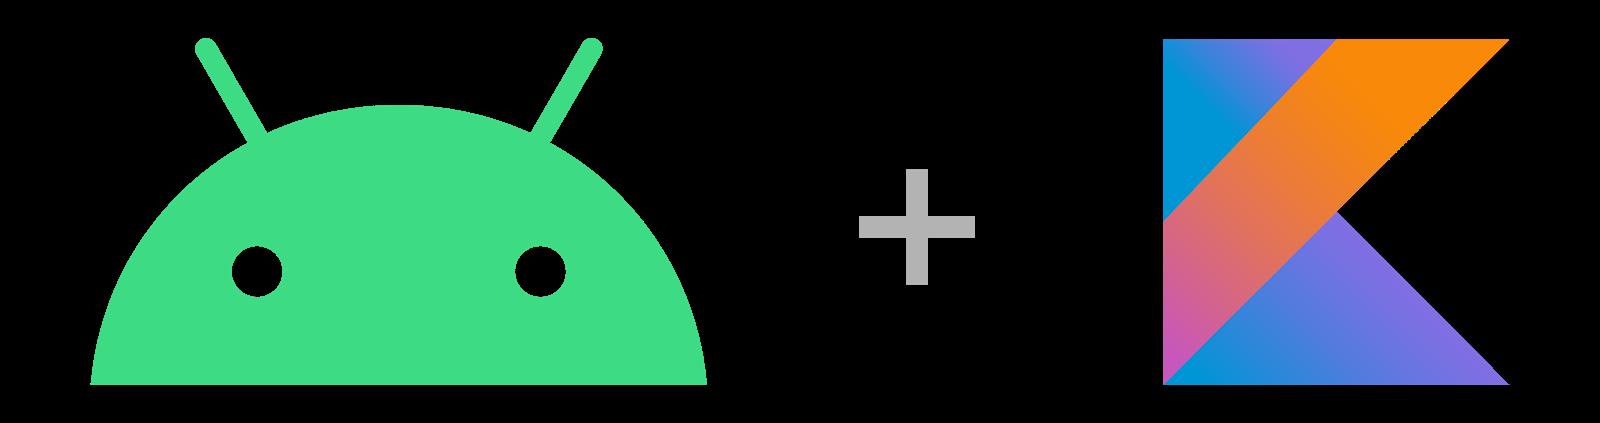 Android 徽标和 Kotlin 徽标